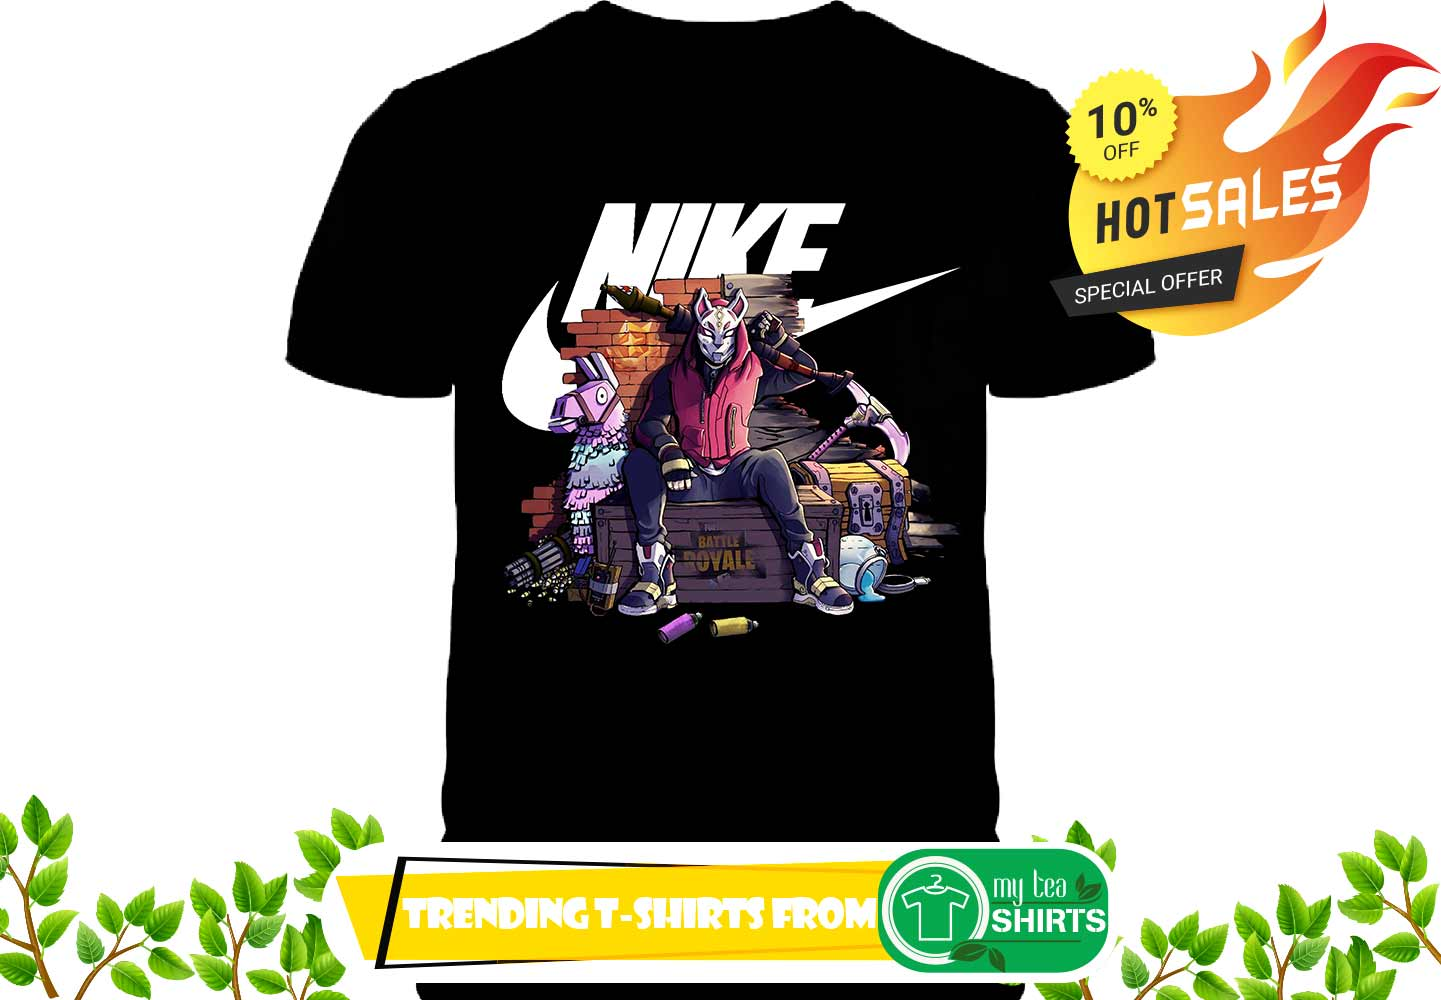 dd7704141 Nike Fortnite Drift Battle Royale shirt, sweat shirt, lady tee ...